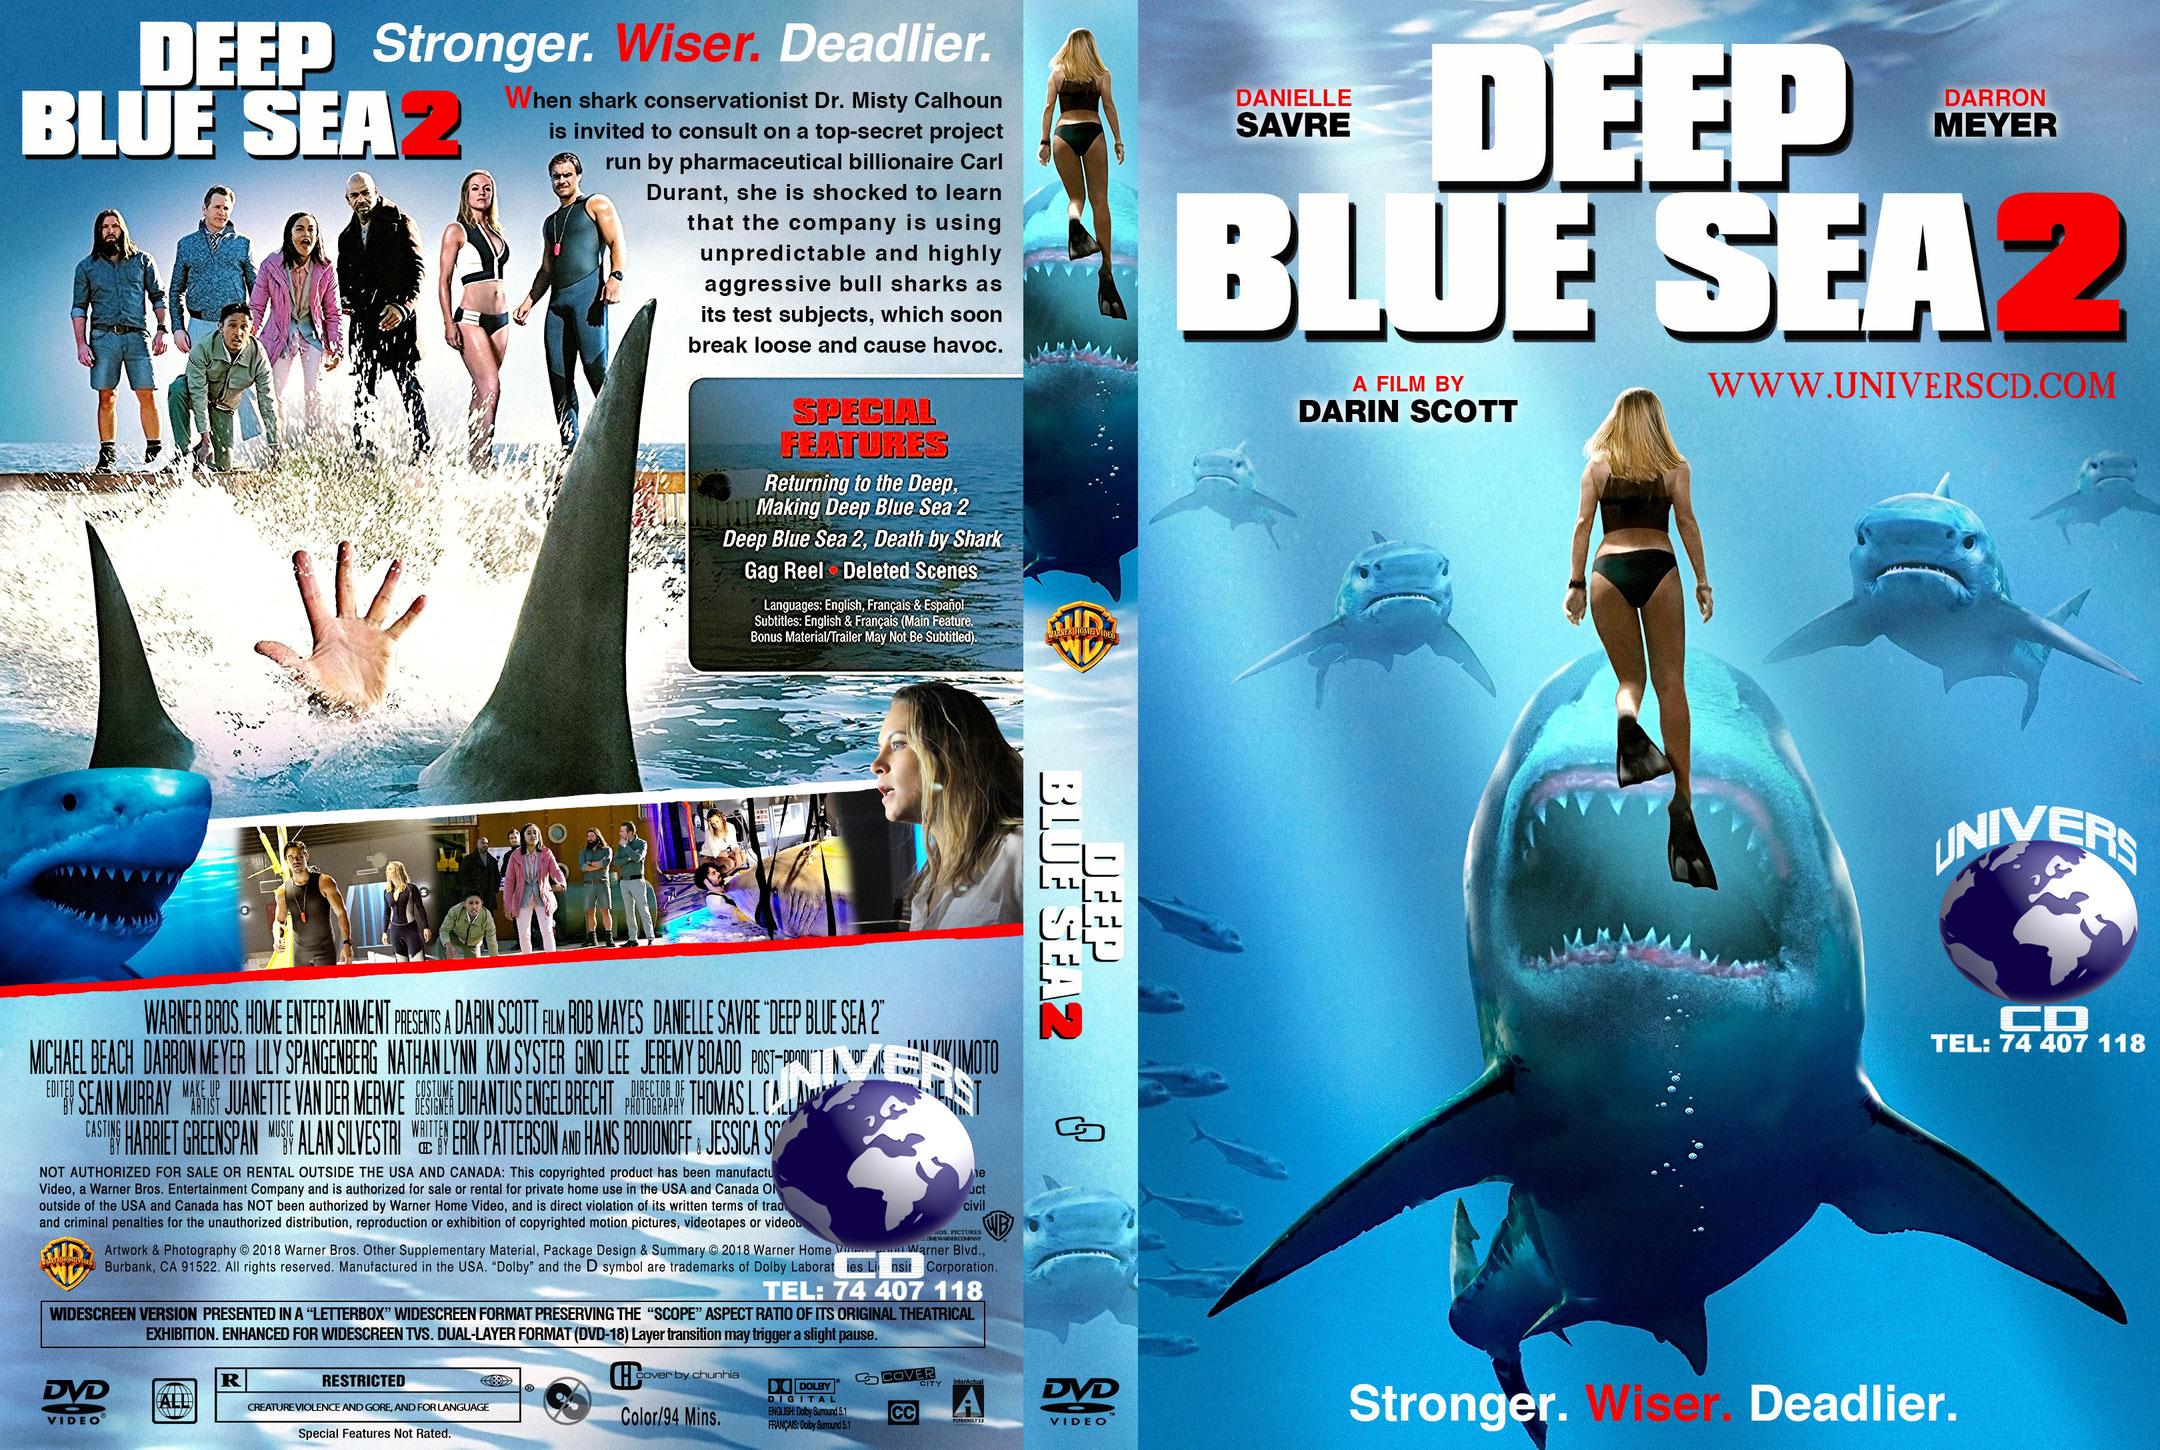 Deep Blue Sea 2 Dvd